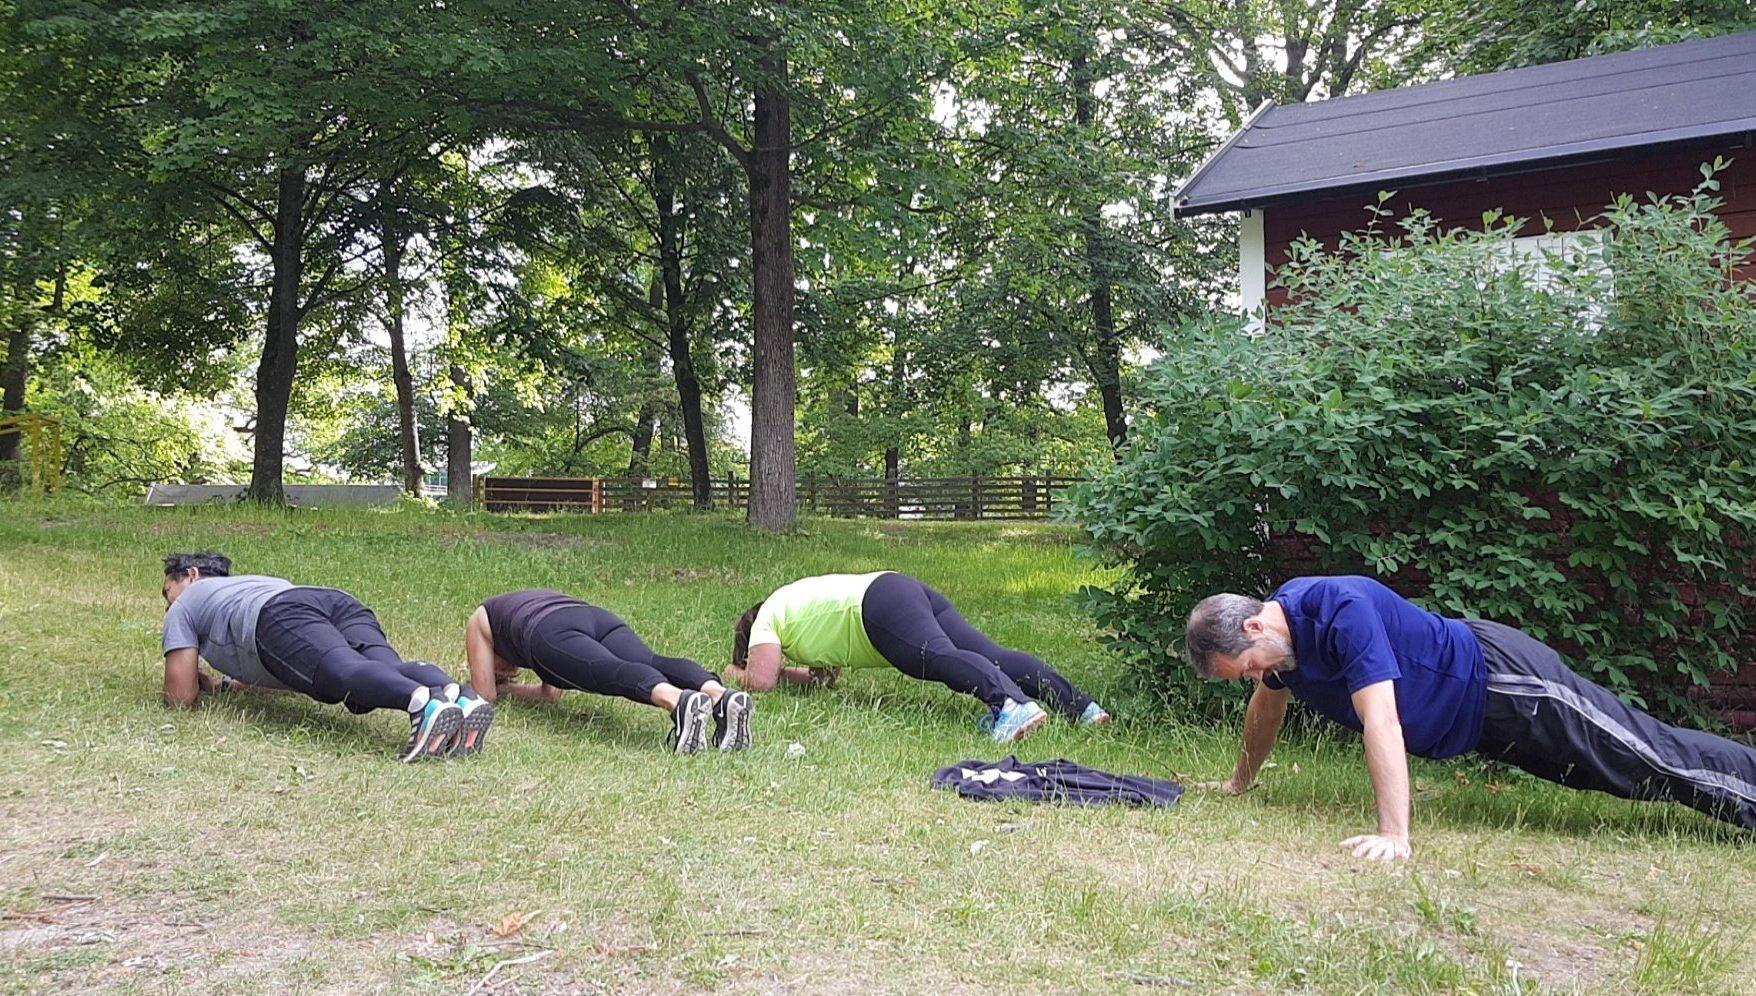 Boka träning